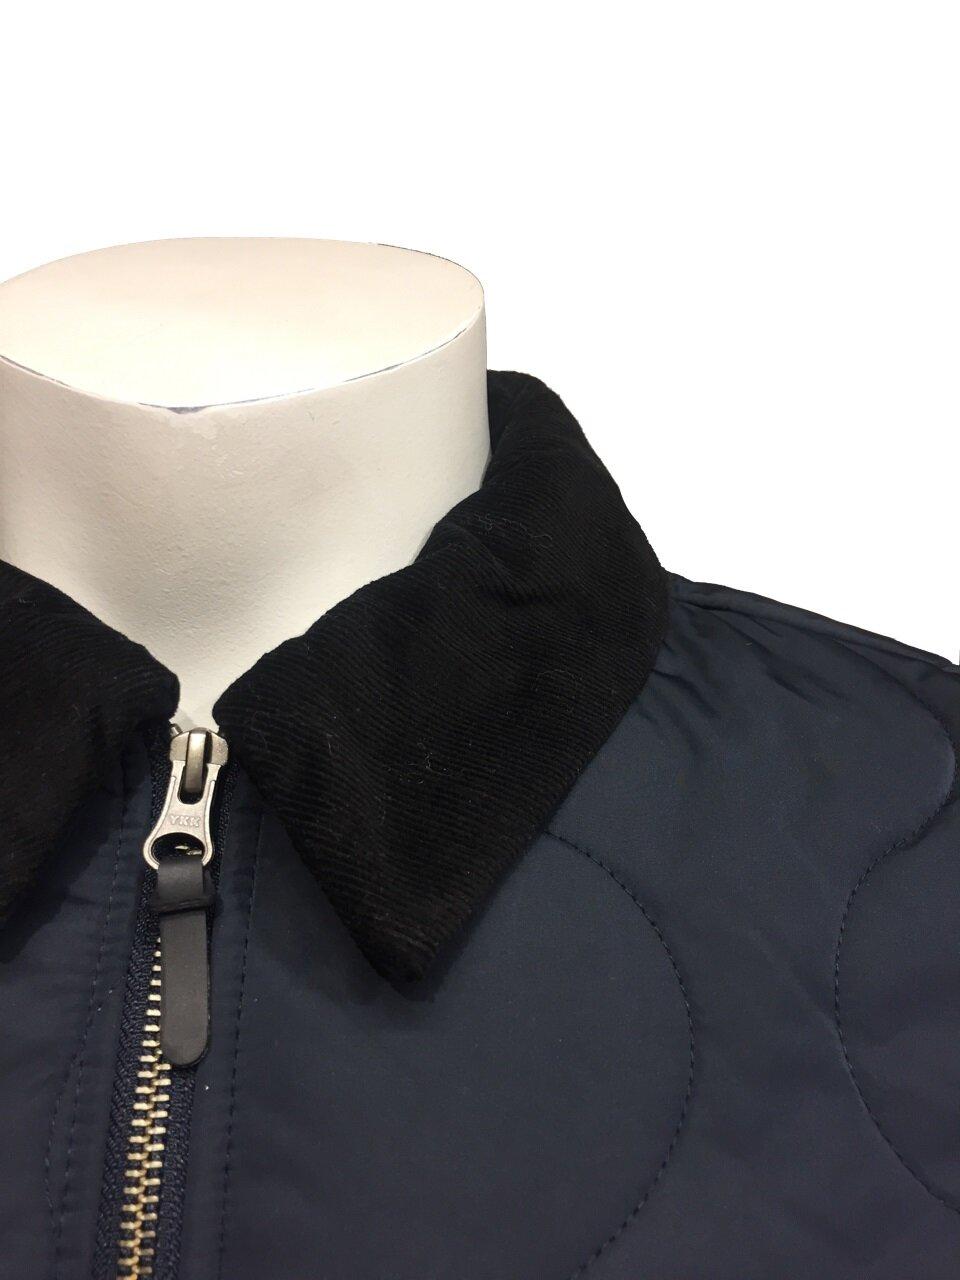 Quilted Jacket Skjortkrage - Navy